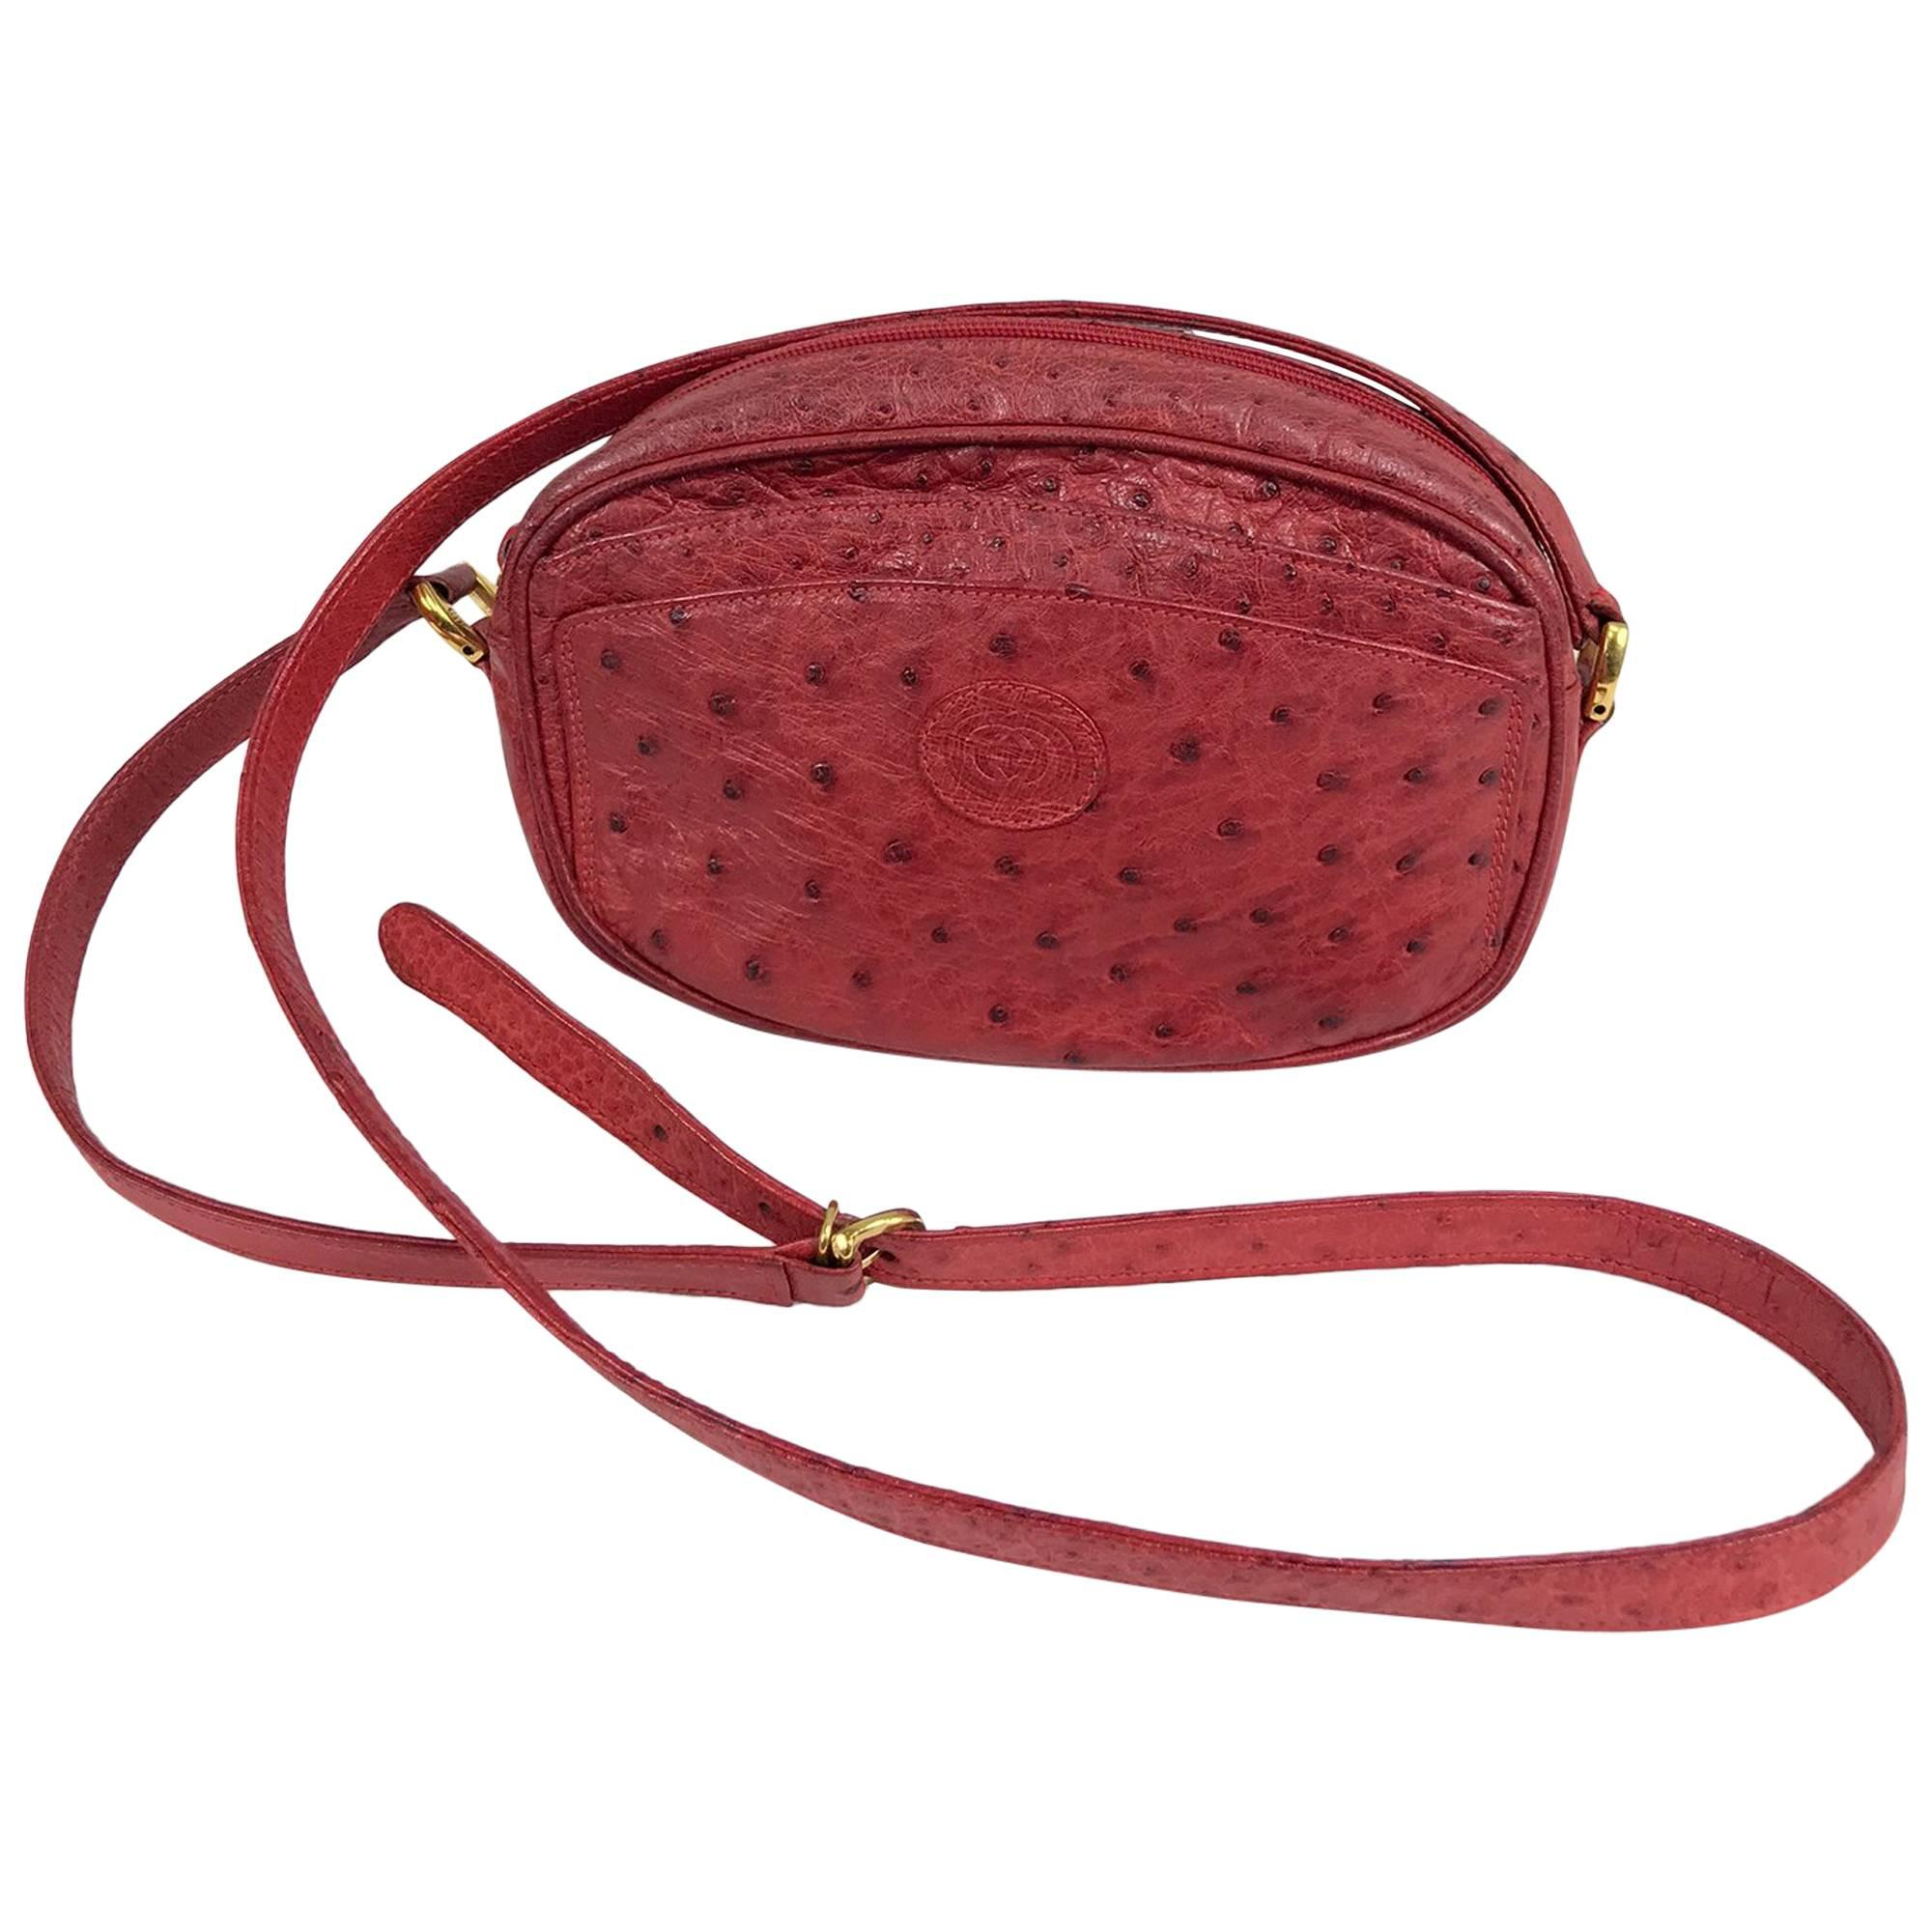 Gucci red ostrich cross body bag 1980s